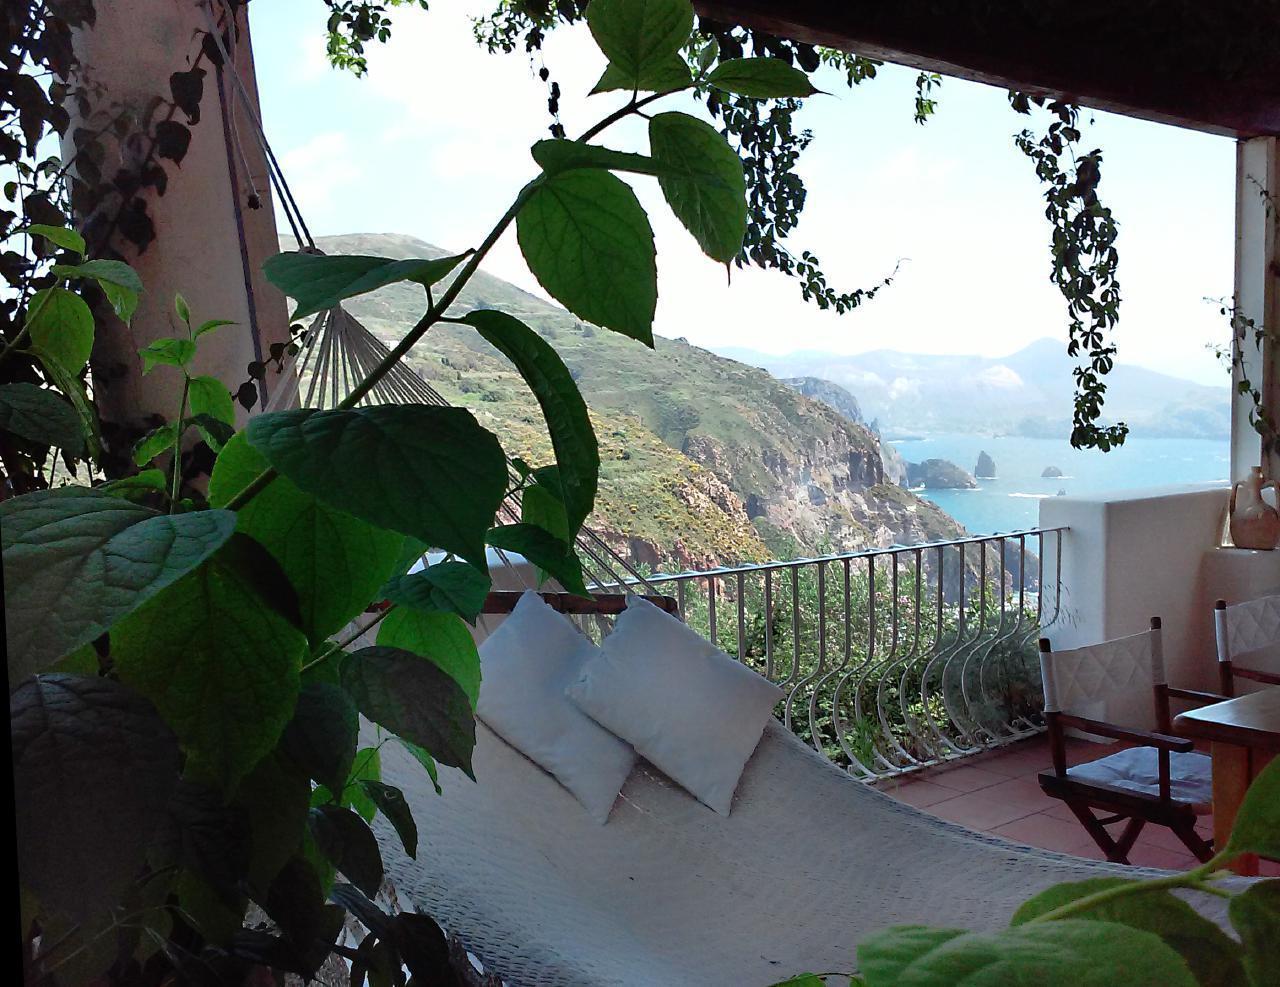 Maison de vacances Ferienhaushälfte Solandra auf sizilianischer Insel mit atemberaubenden Meeres-Rundblick (2038046), Lipari, Lipari, Sicile, Italie, image 30